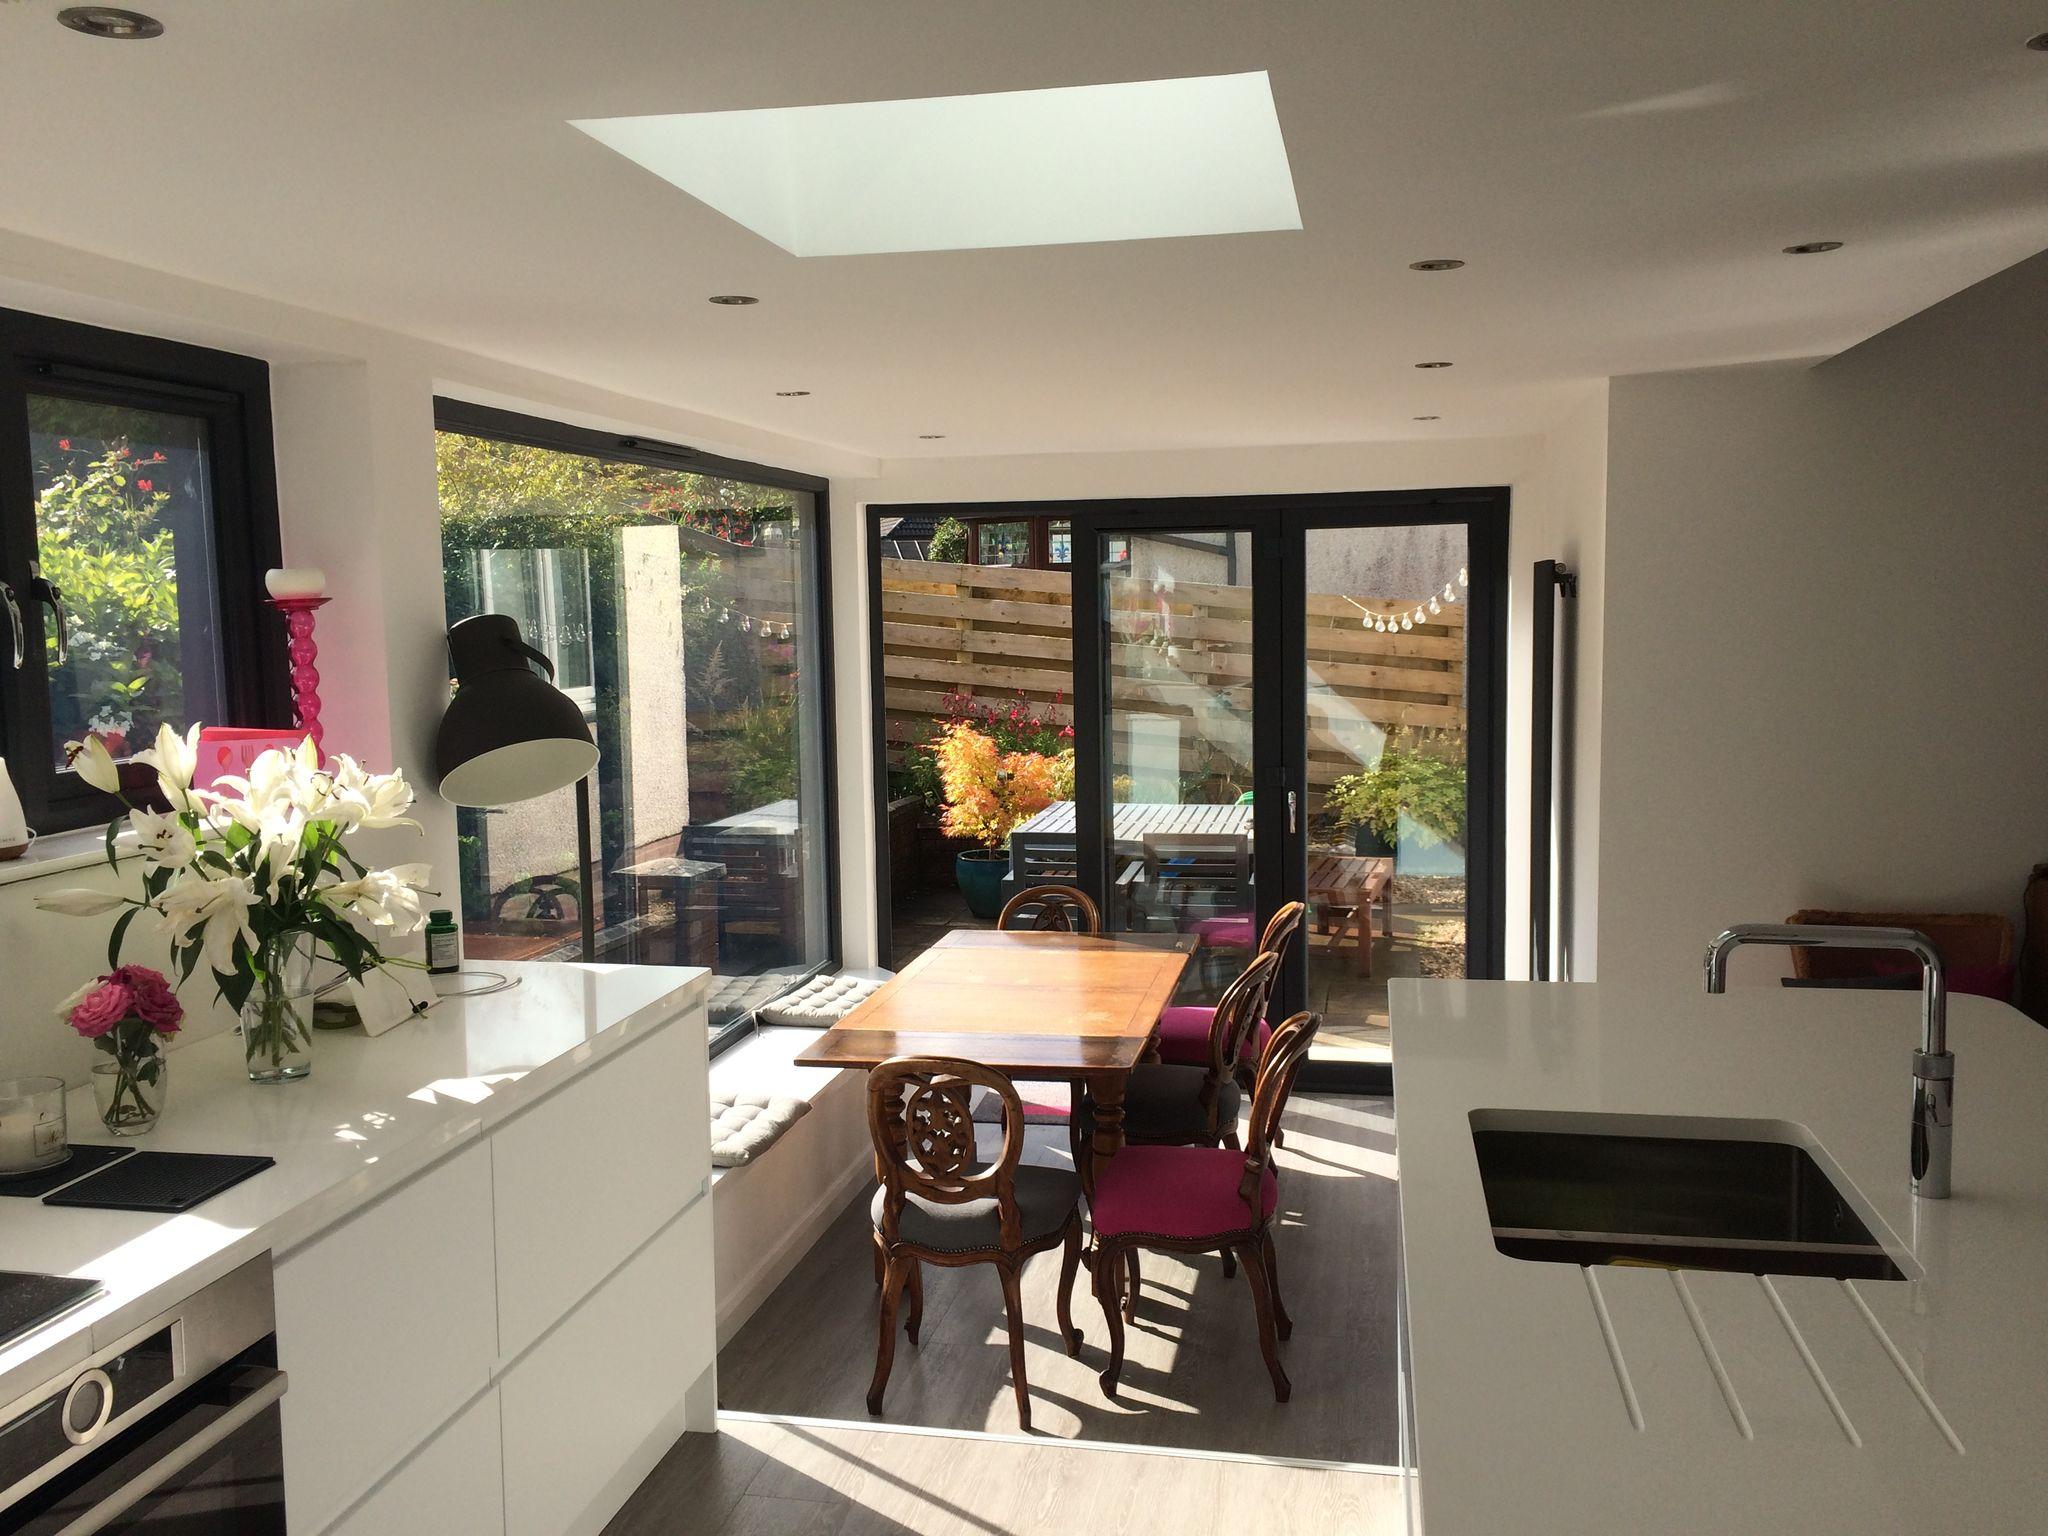 Flat roof window 2